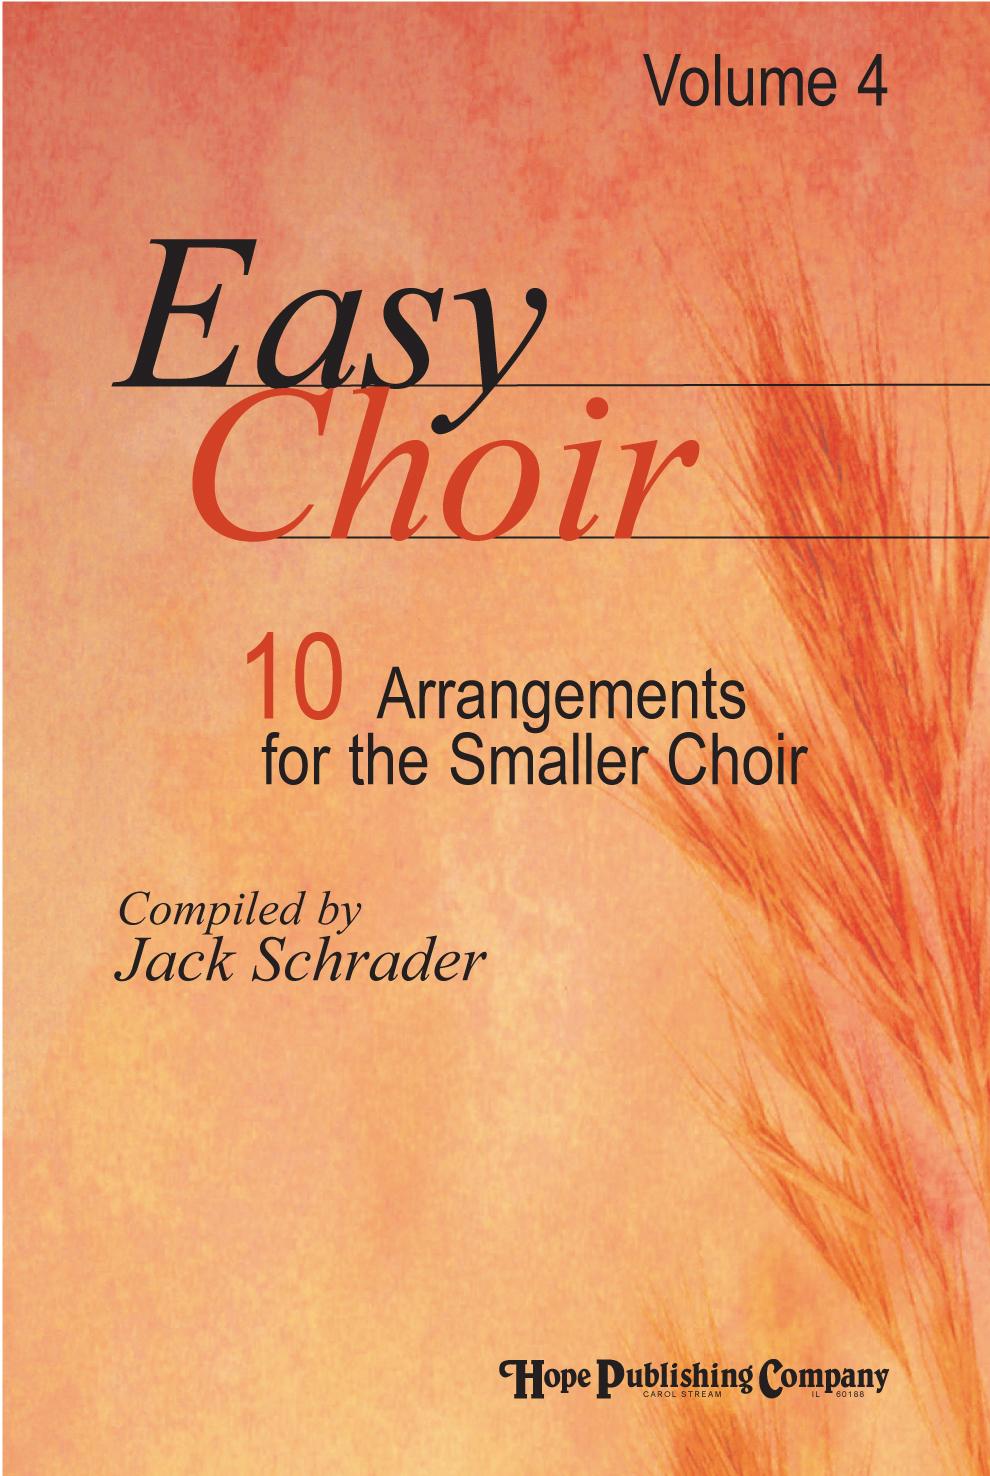 Easy Choir Vol. 4 - Score Cover Image